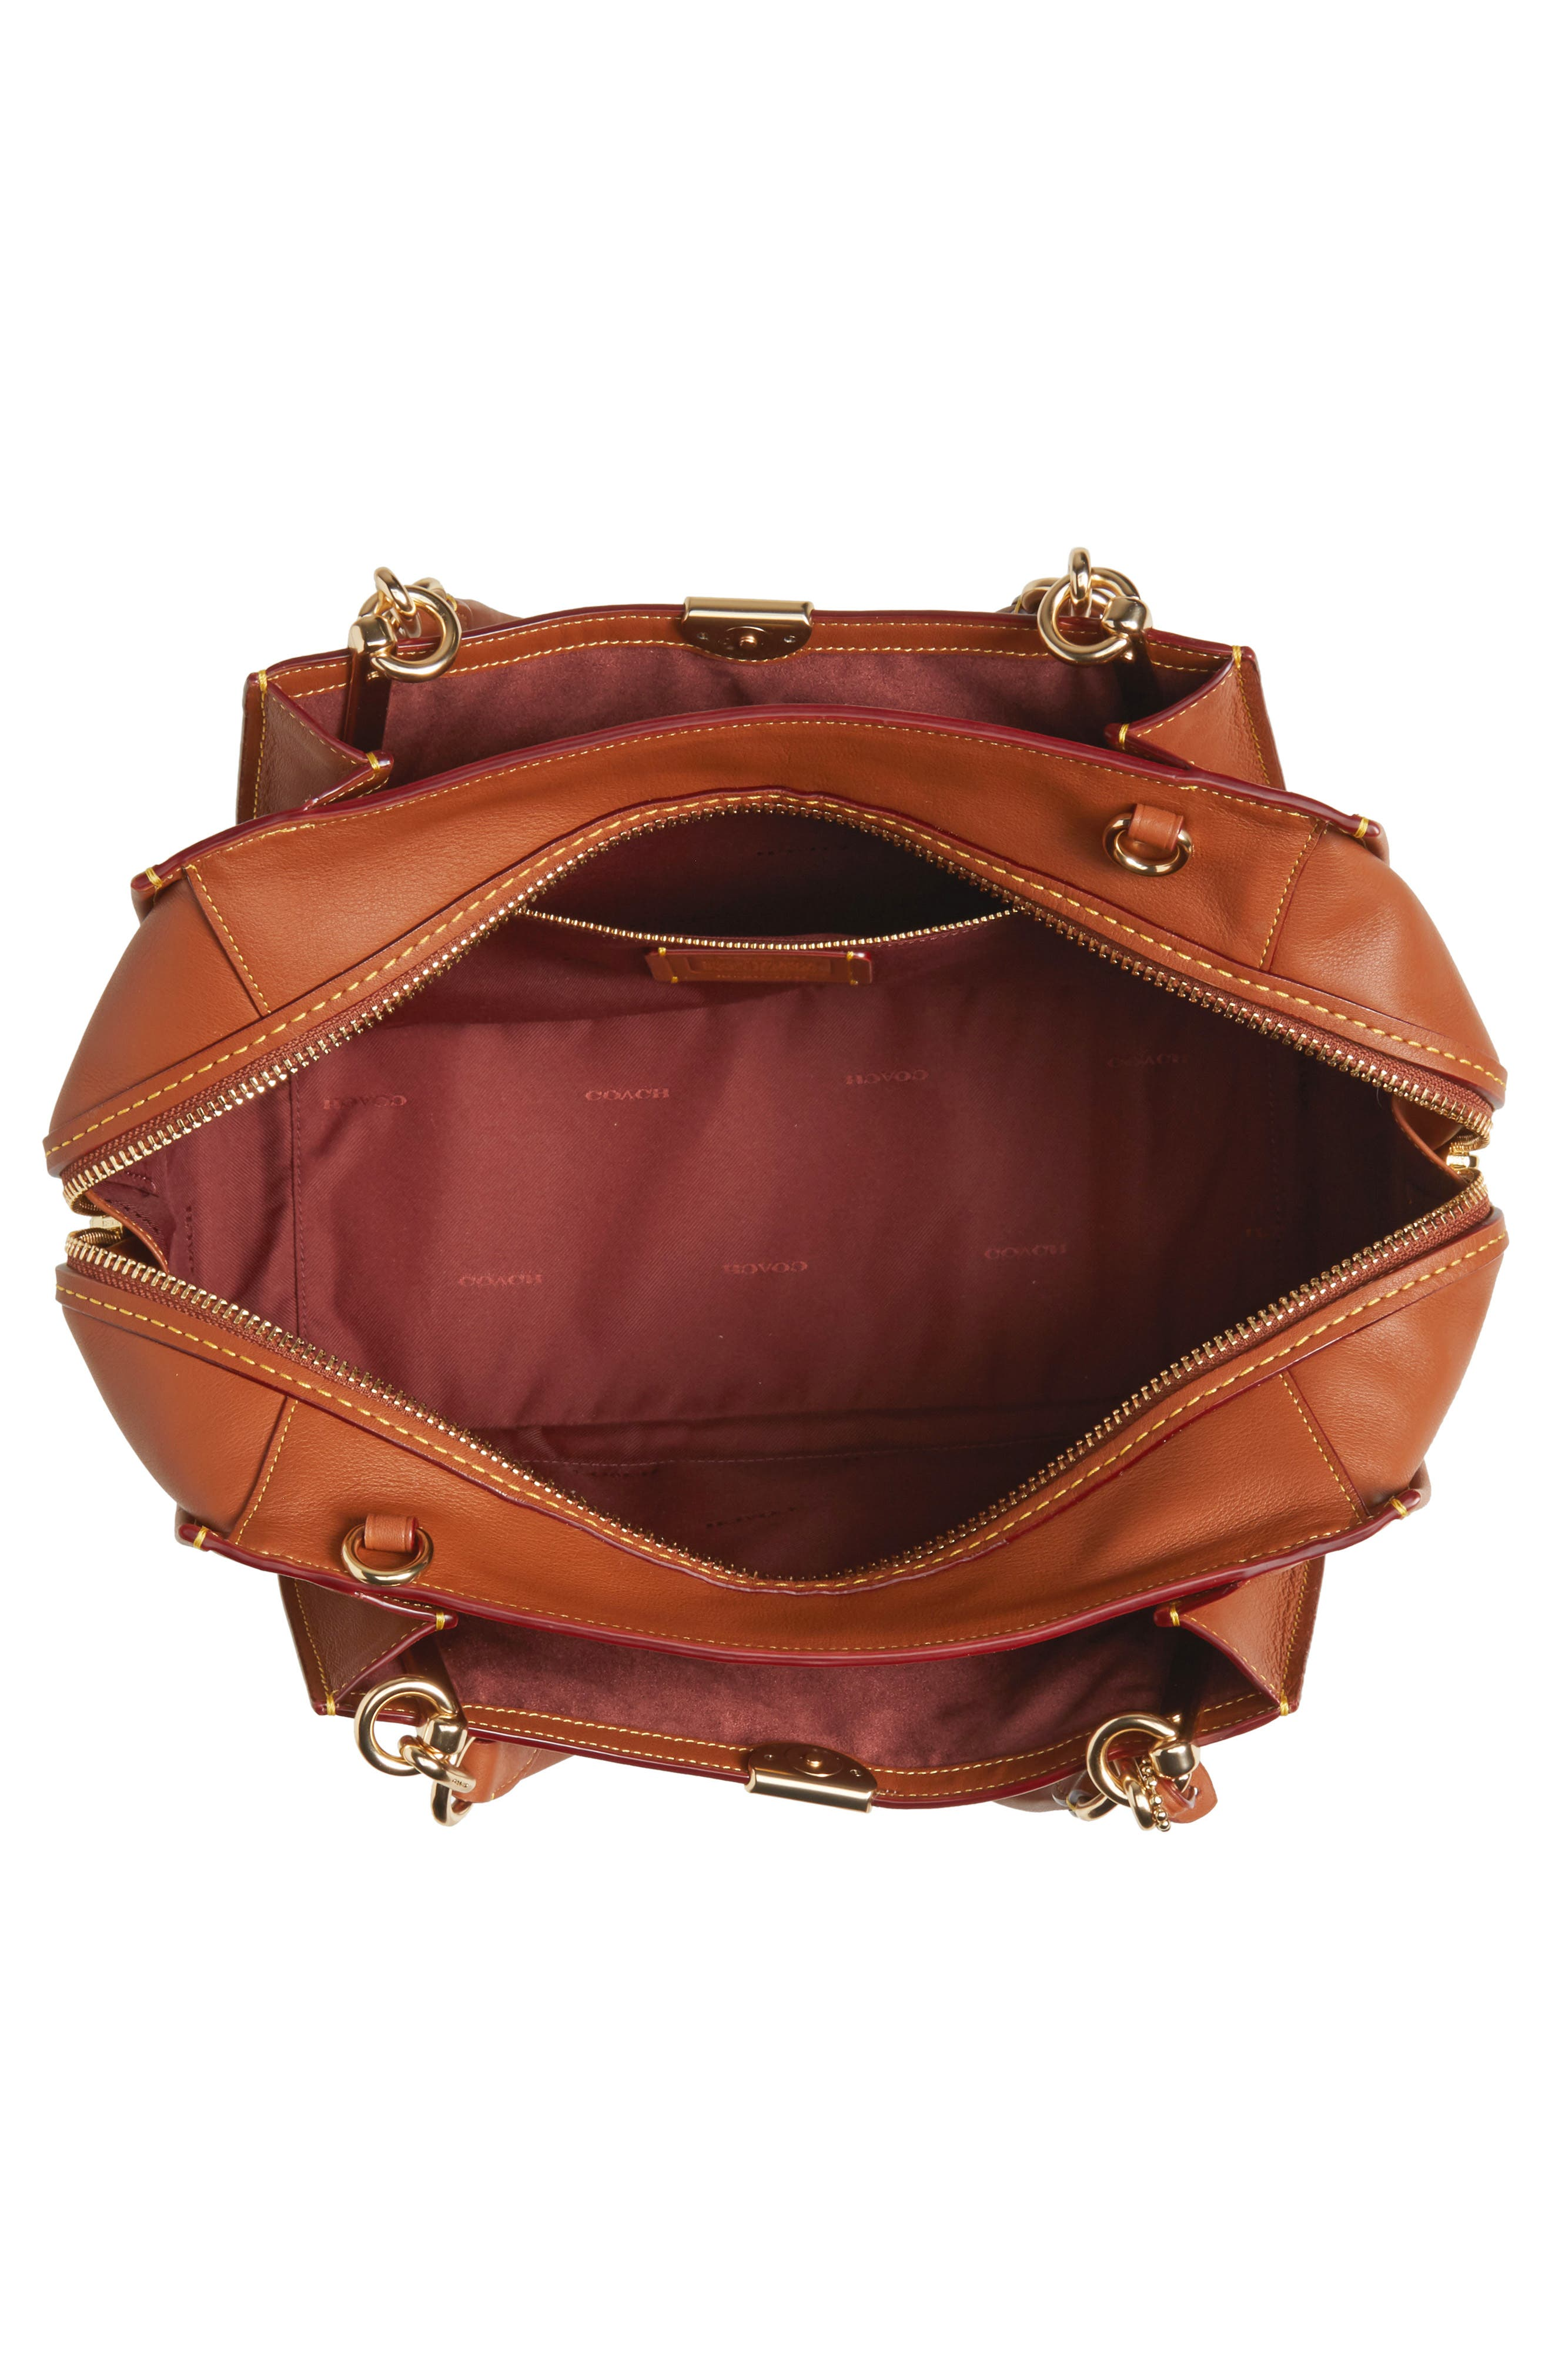 COACH,                             Dreamer 36 Leather Bag,                             Alternate thumbnail 4, color,                             LI/ 1941 SADDLE